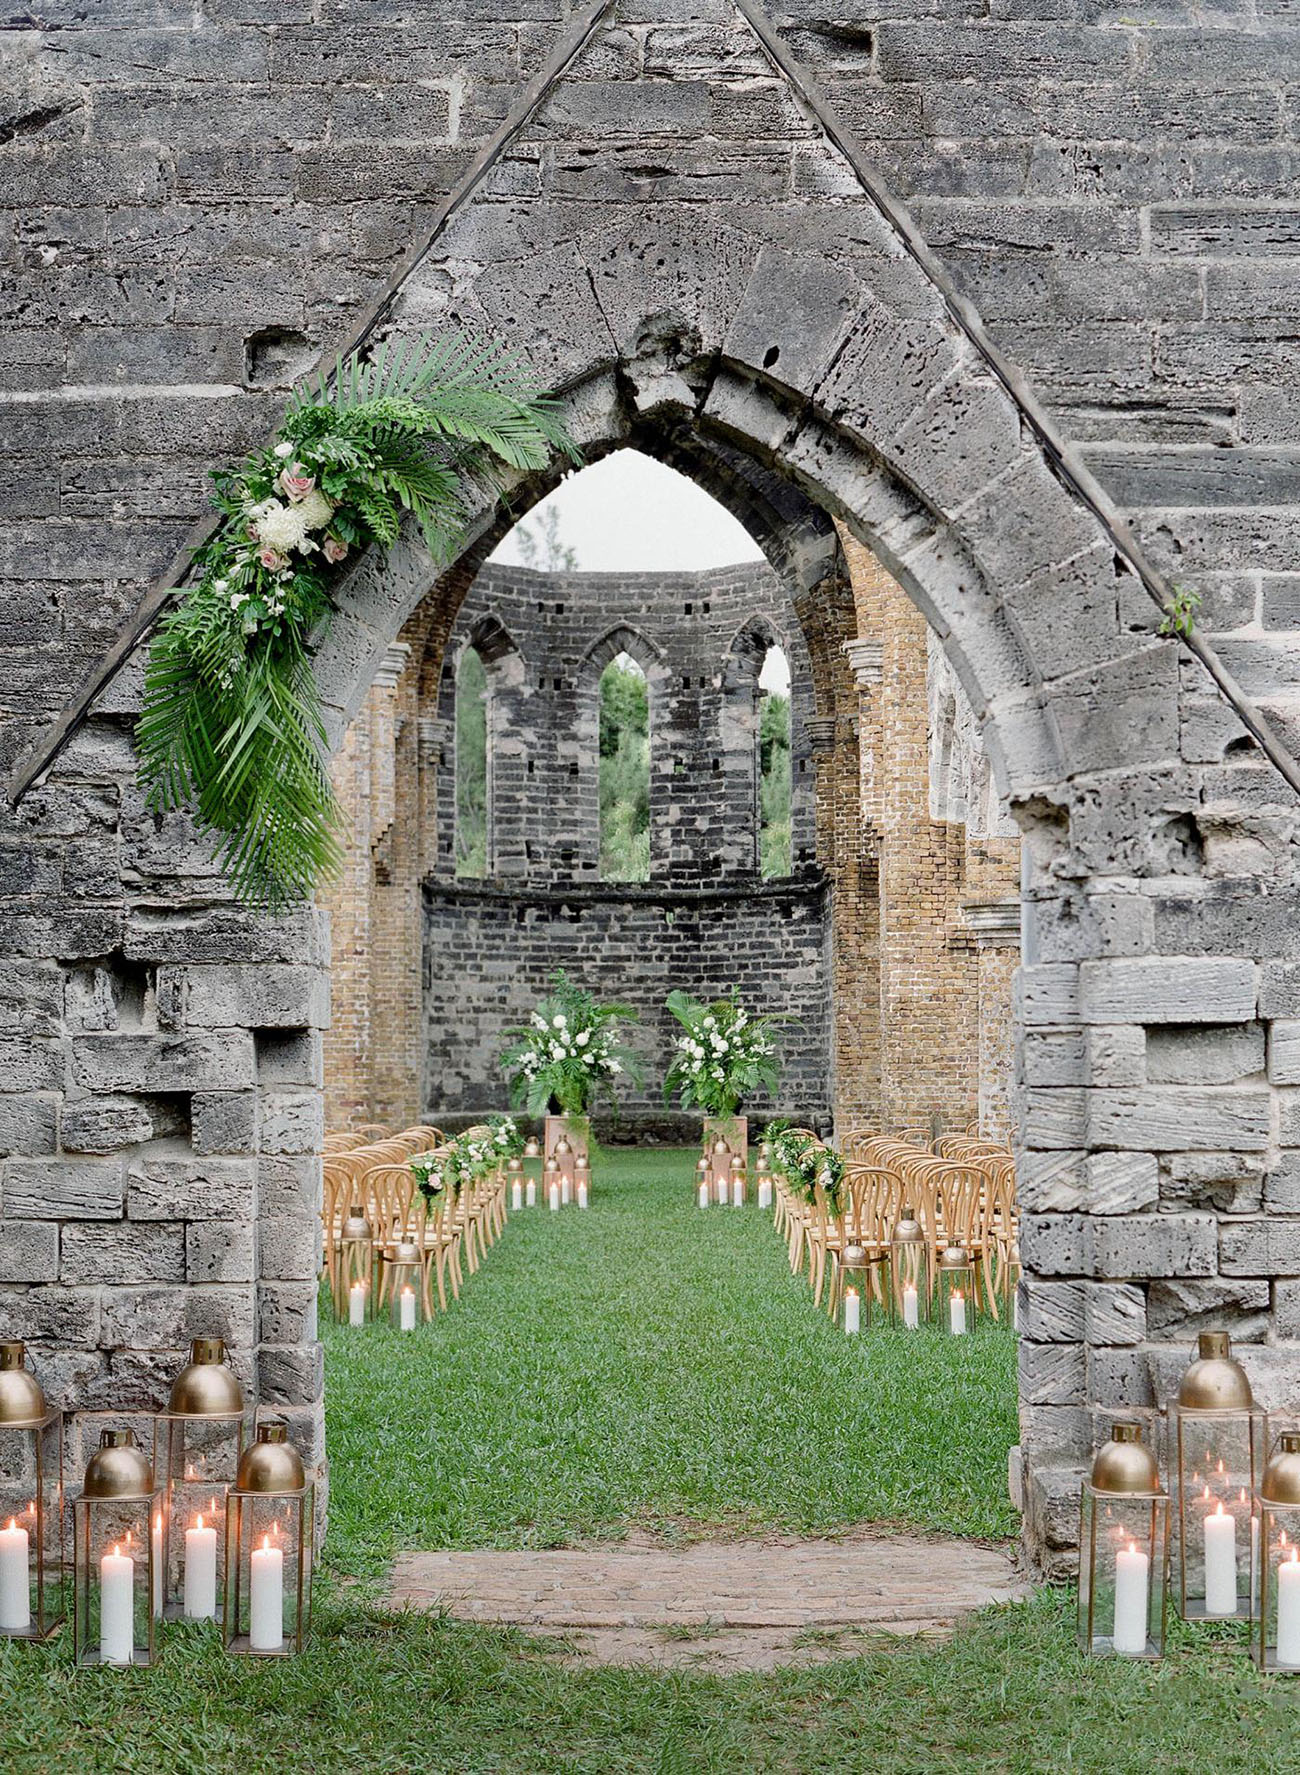 Bermuda Ruin unfinished church abandoned venue